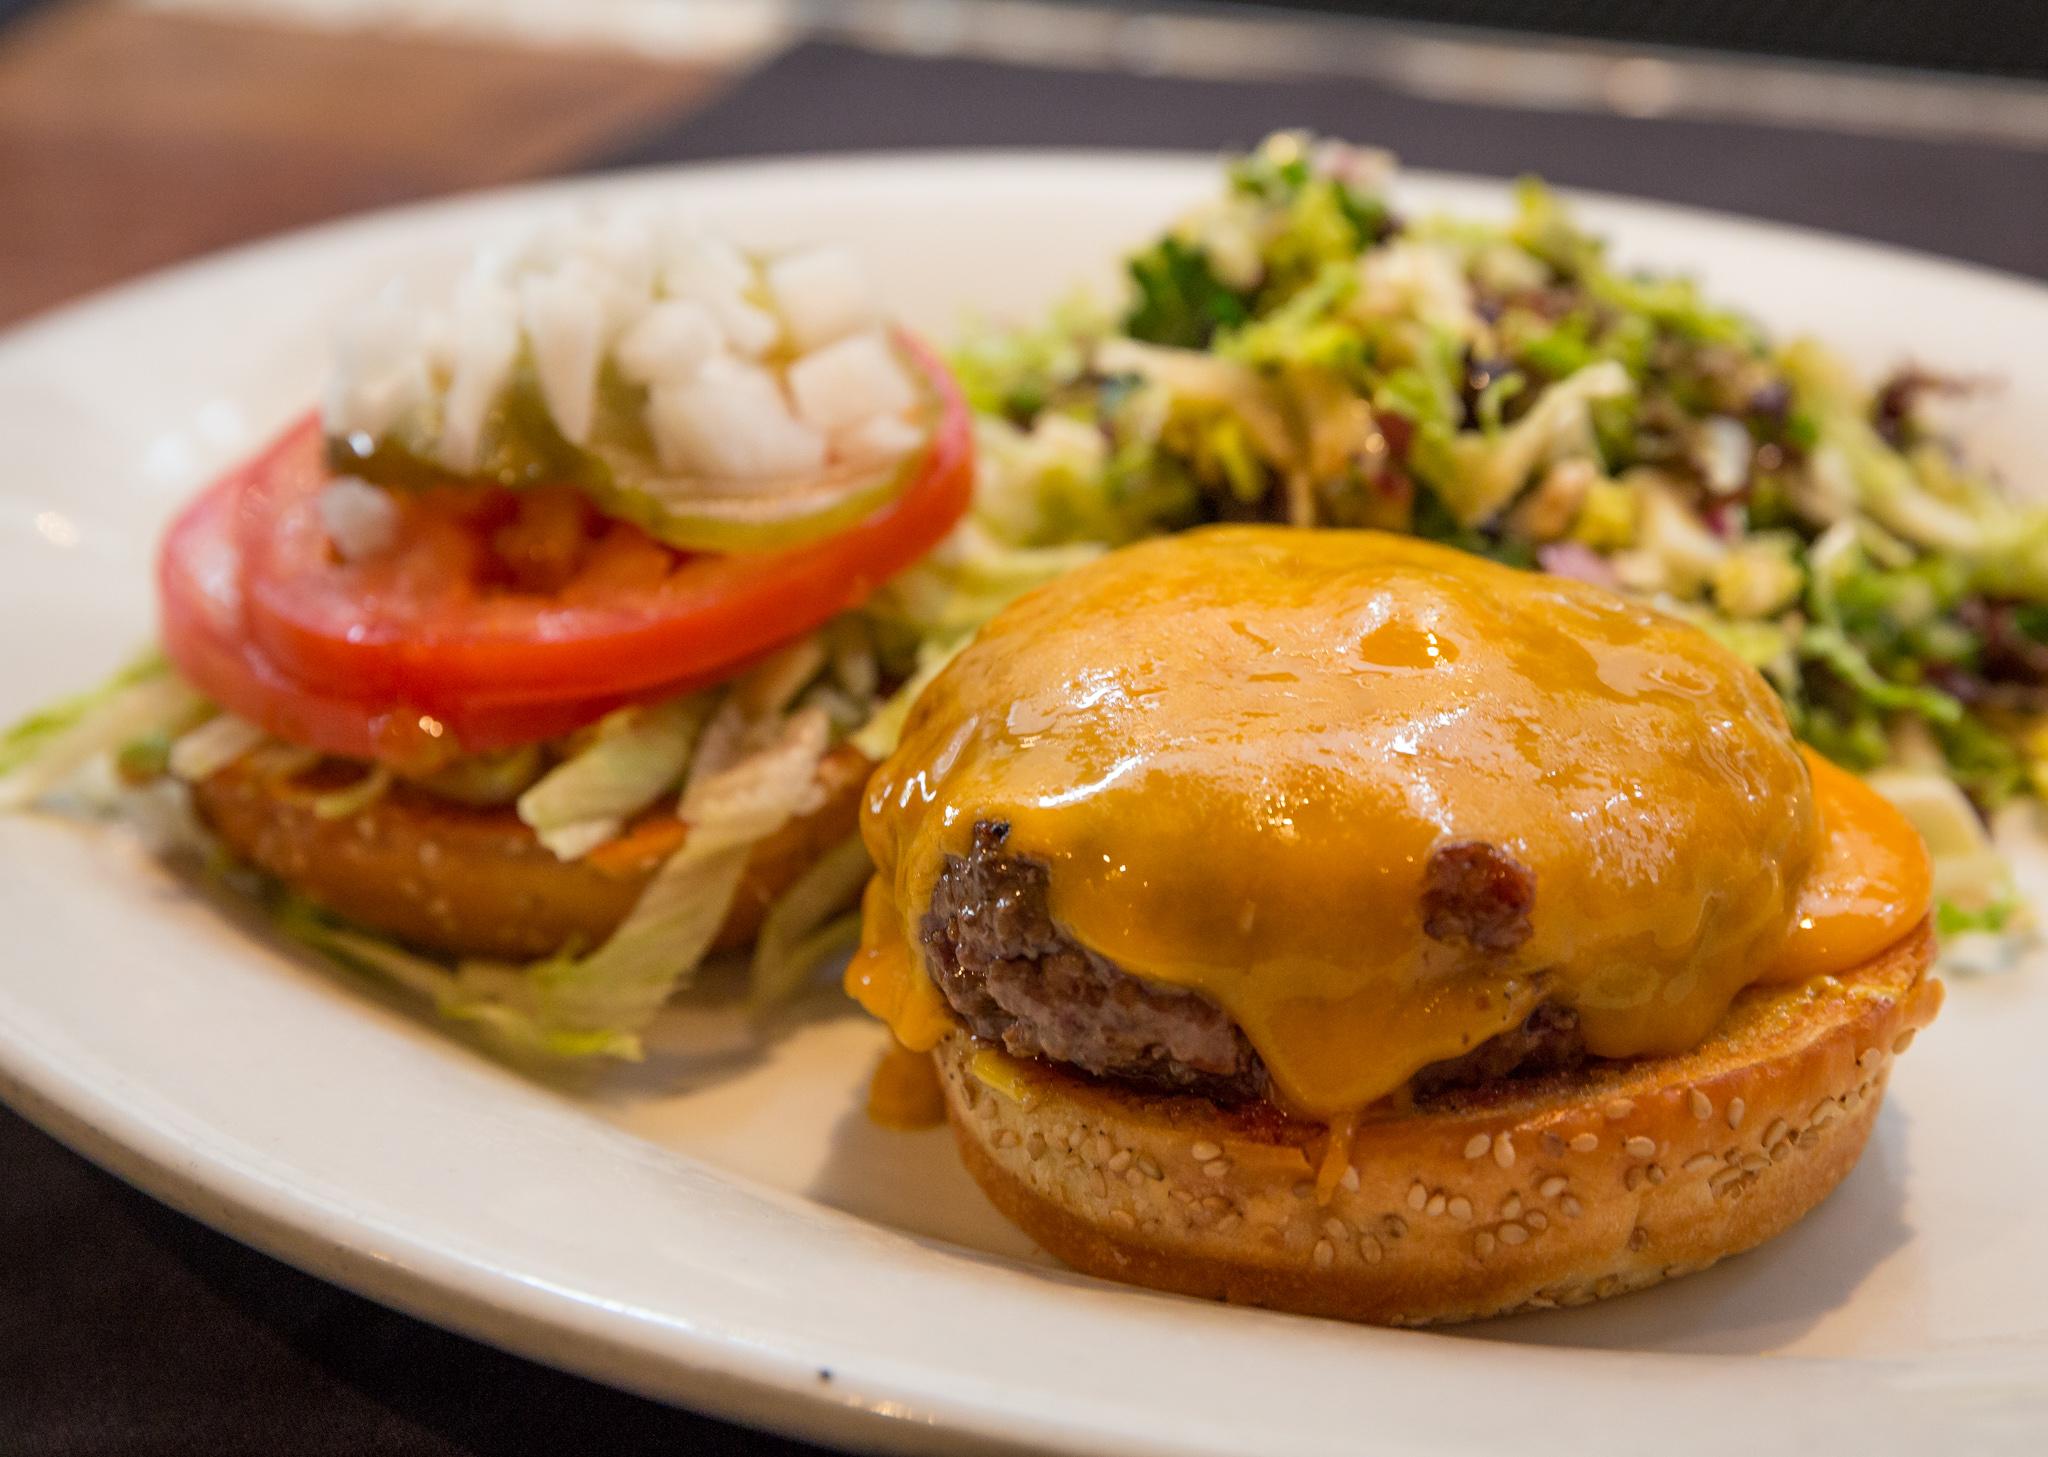 Nick's Laguna Beach burger